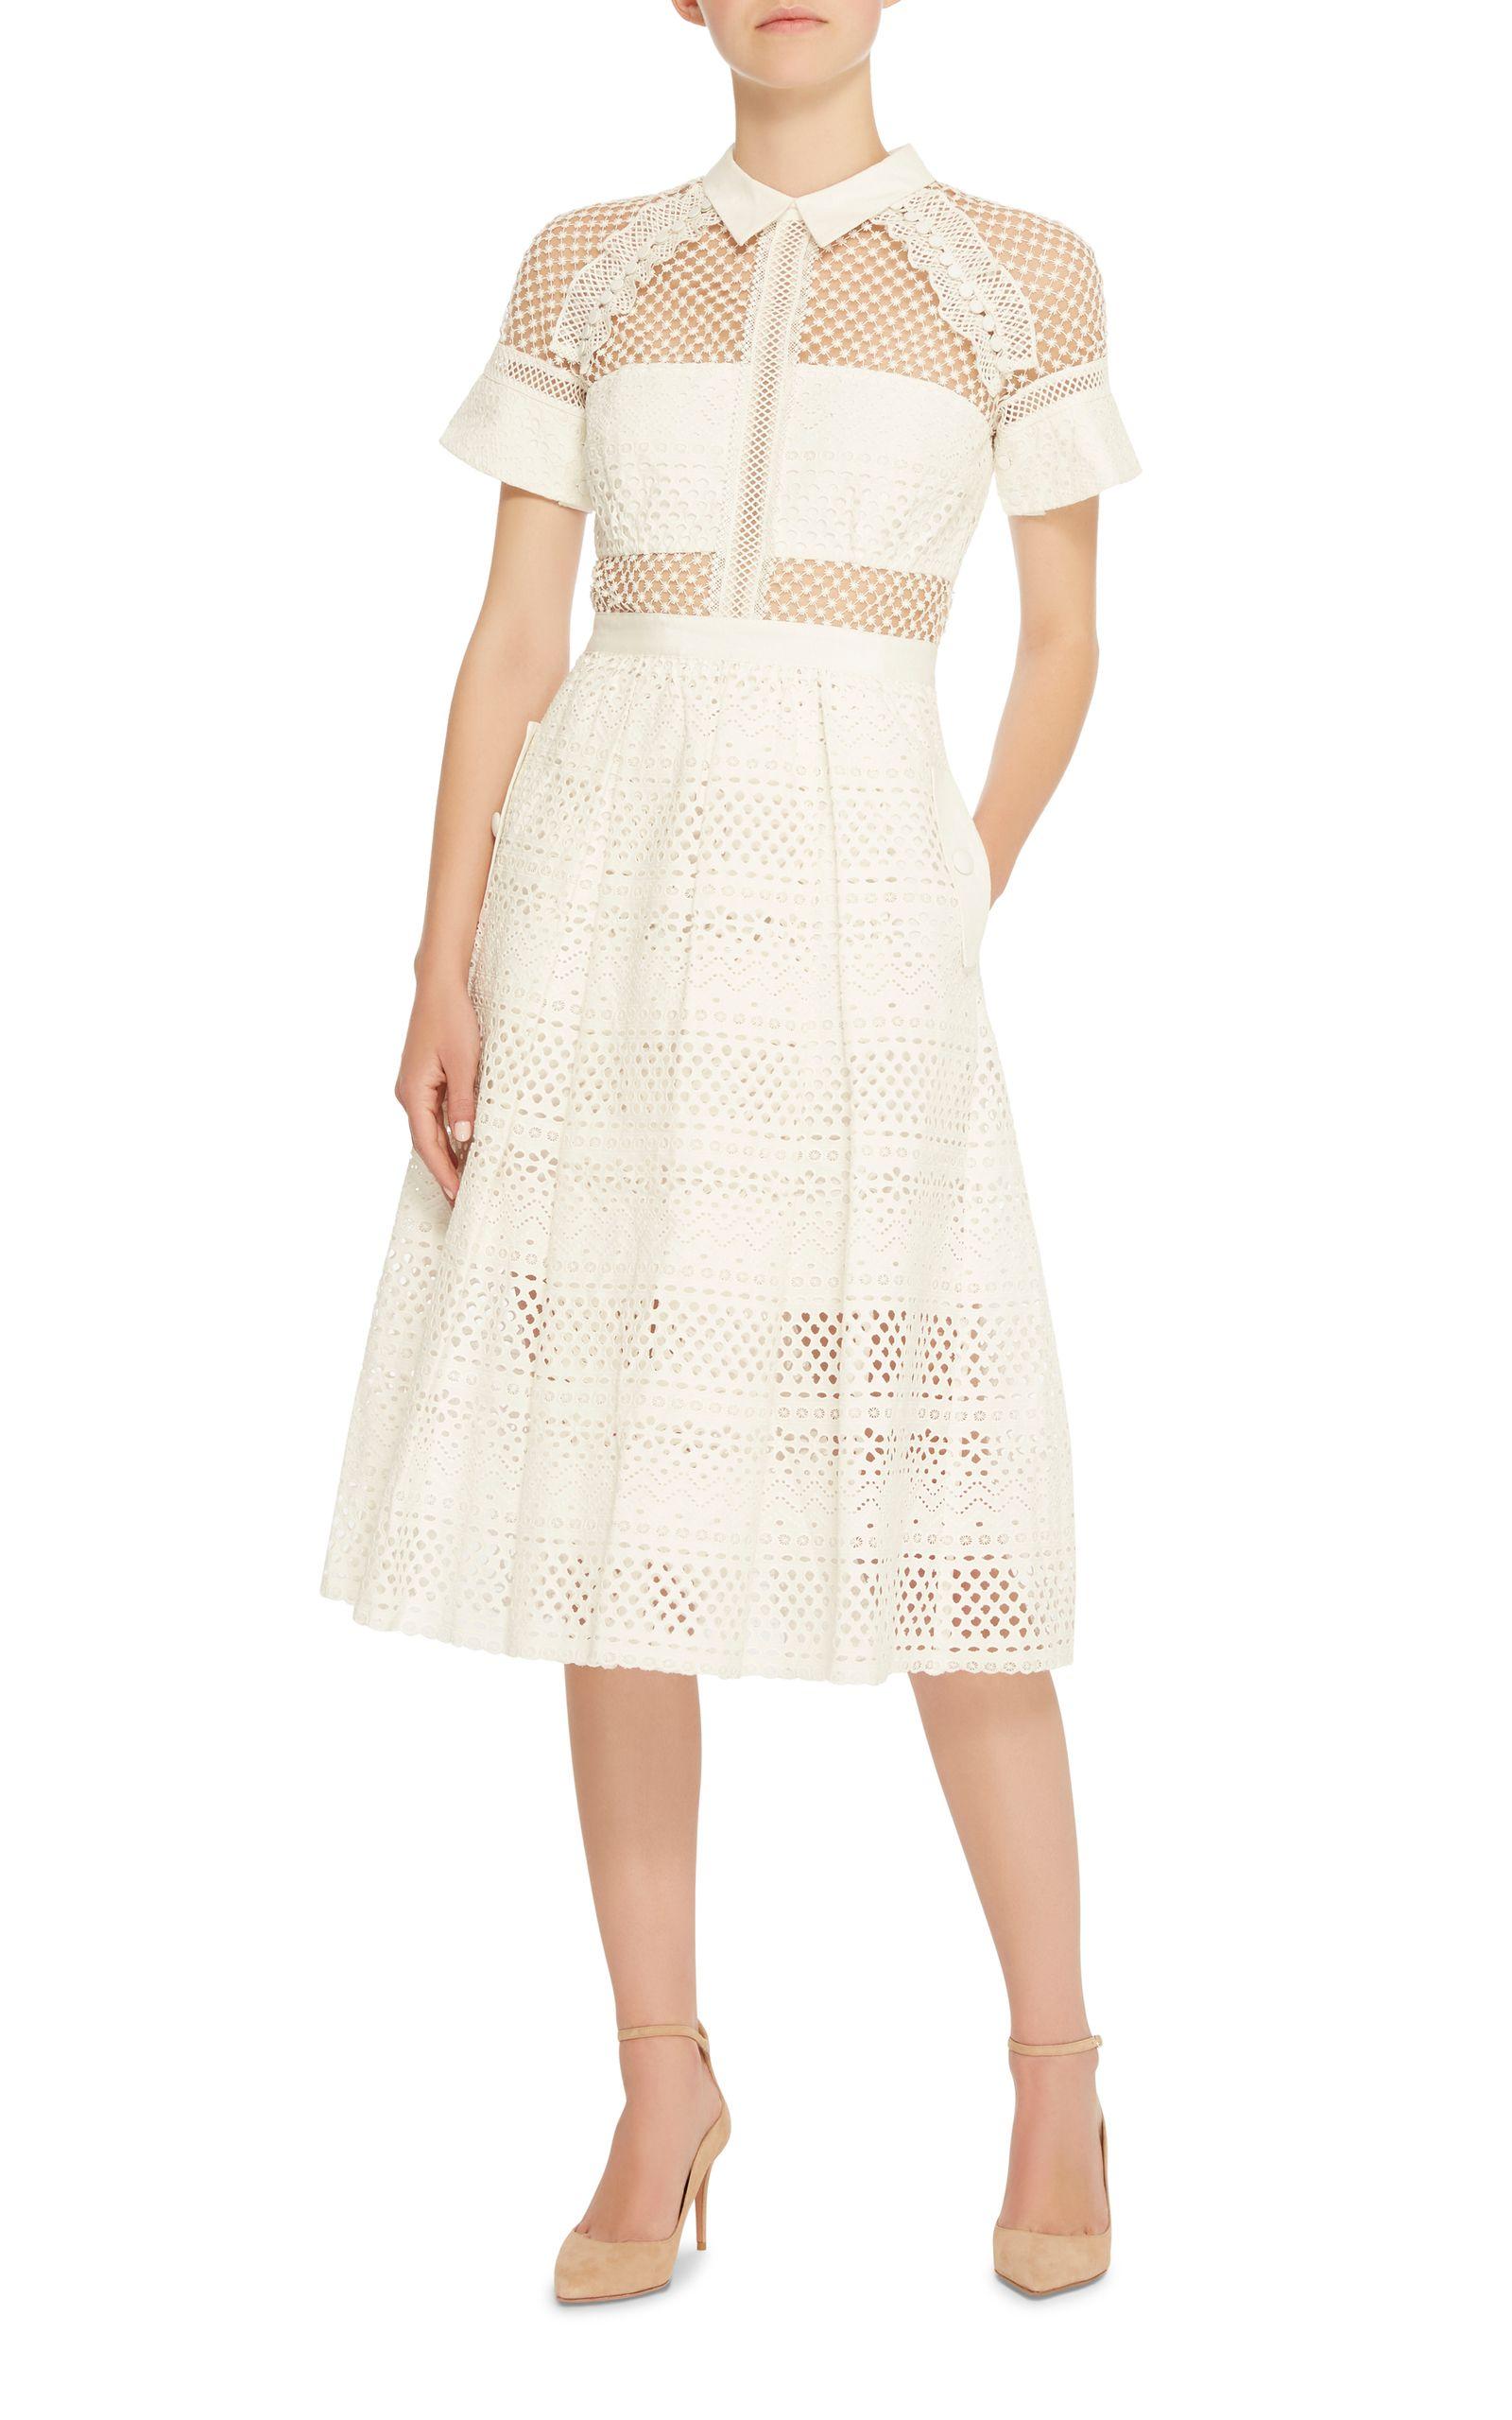 Pin by sara grand on dresses pinterest dress skirt